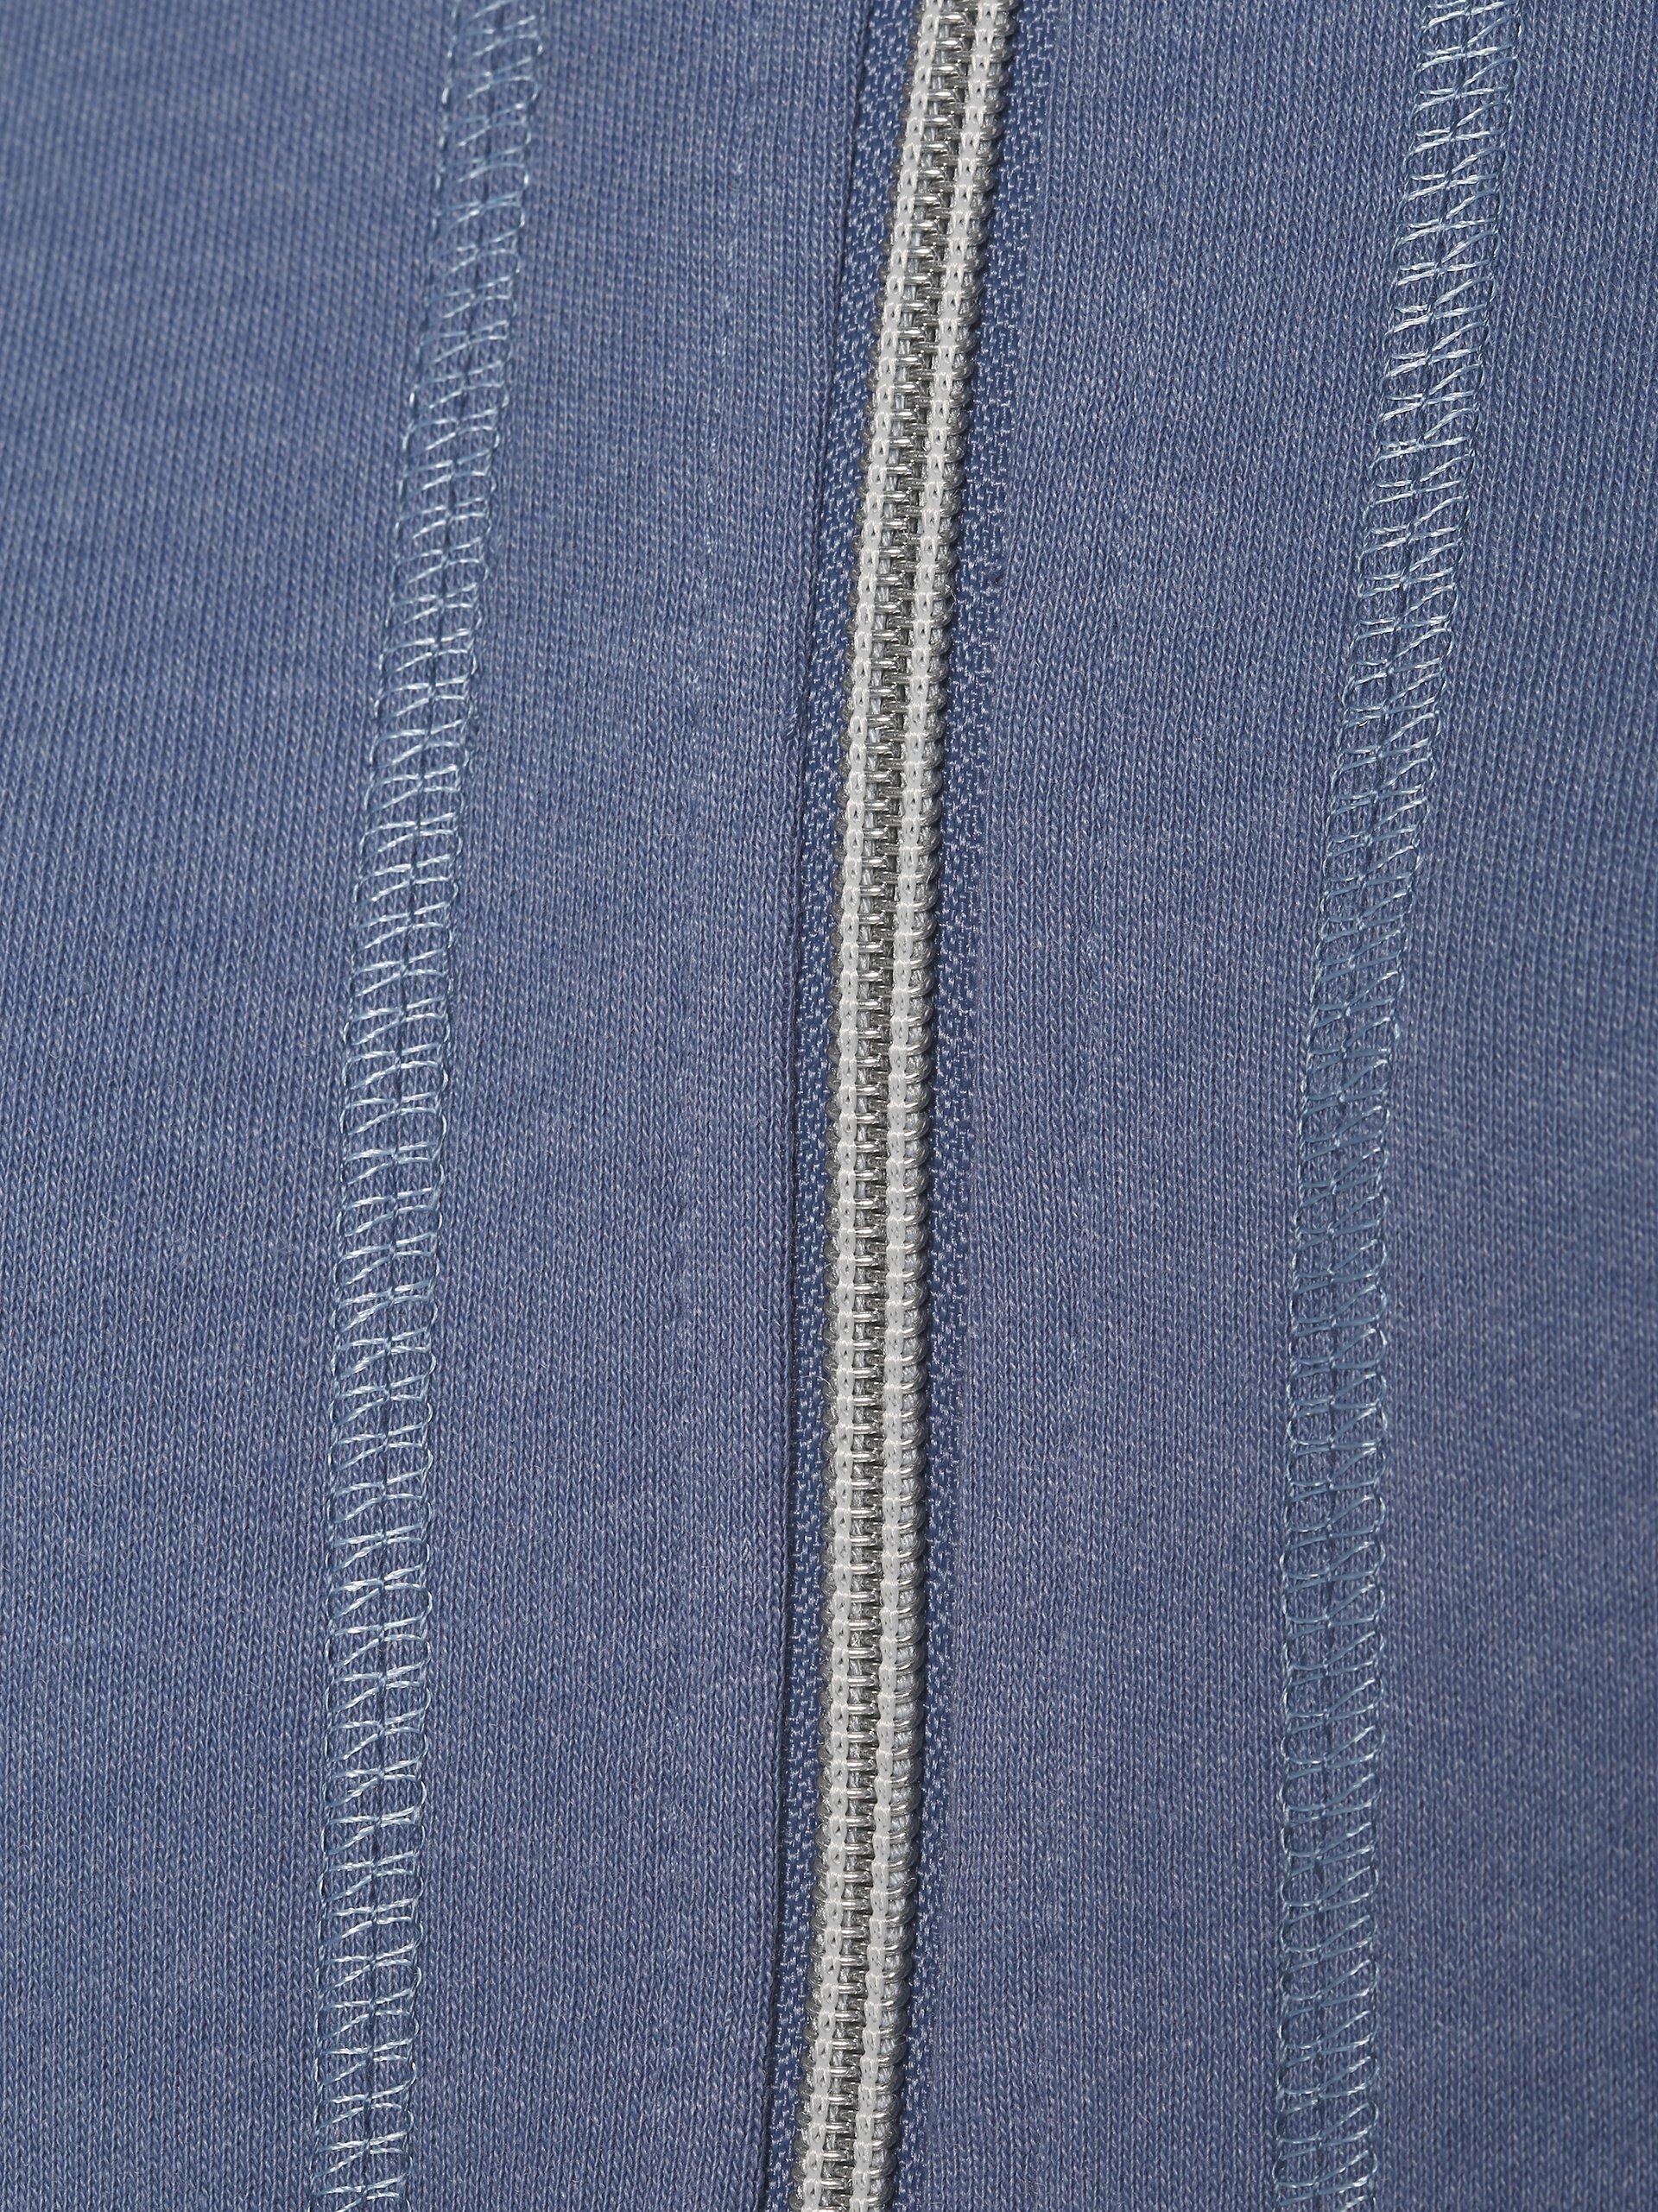 Franco Callegari Damska bluza rozpinana